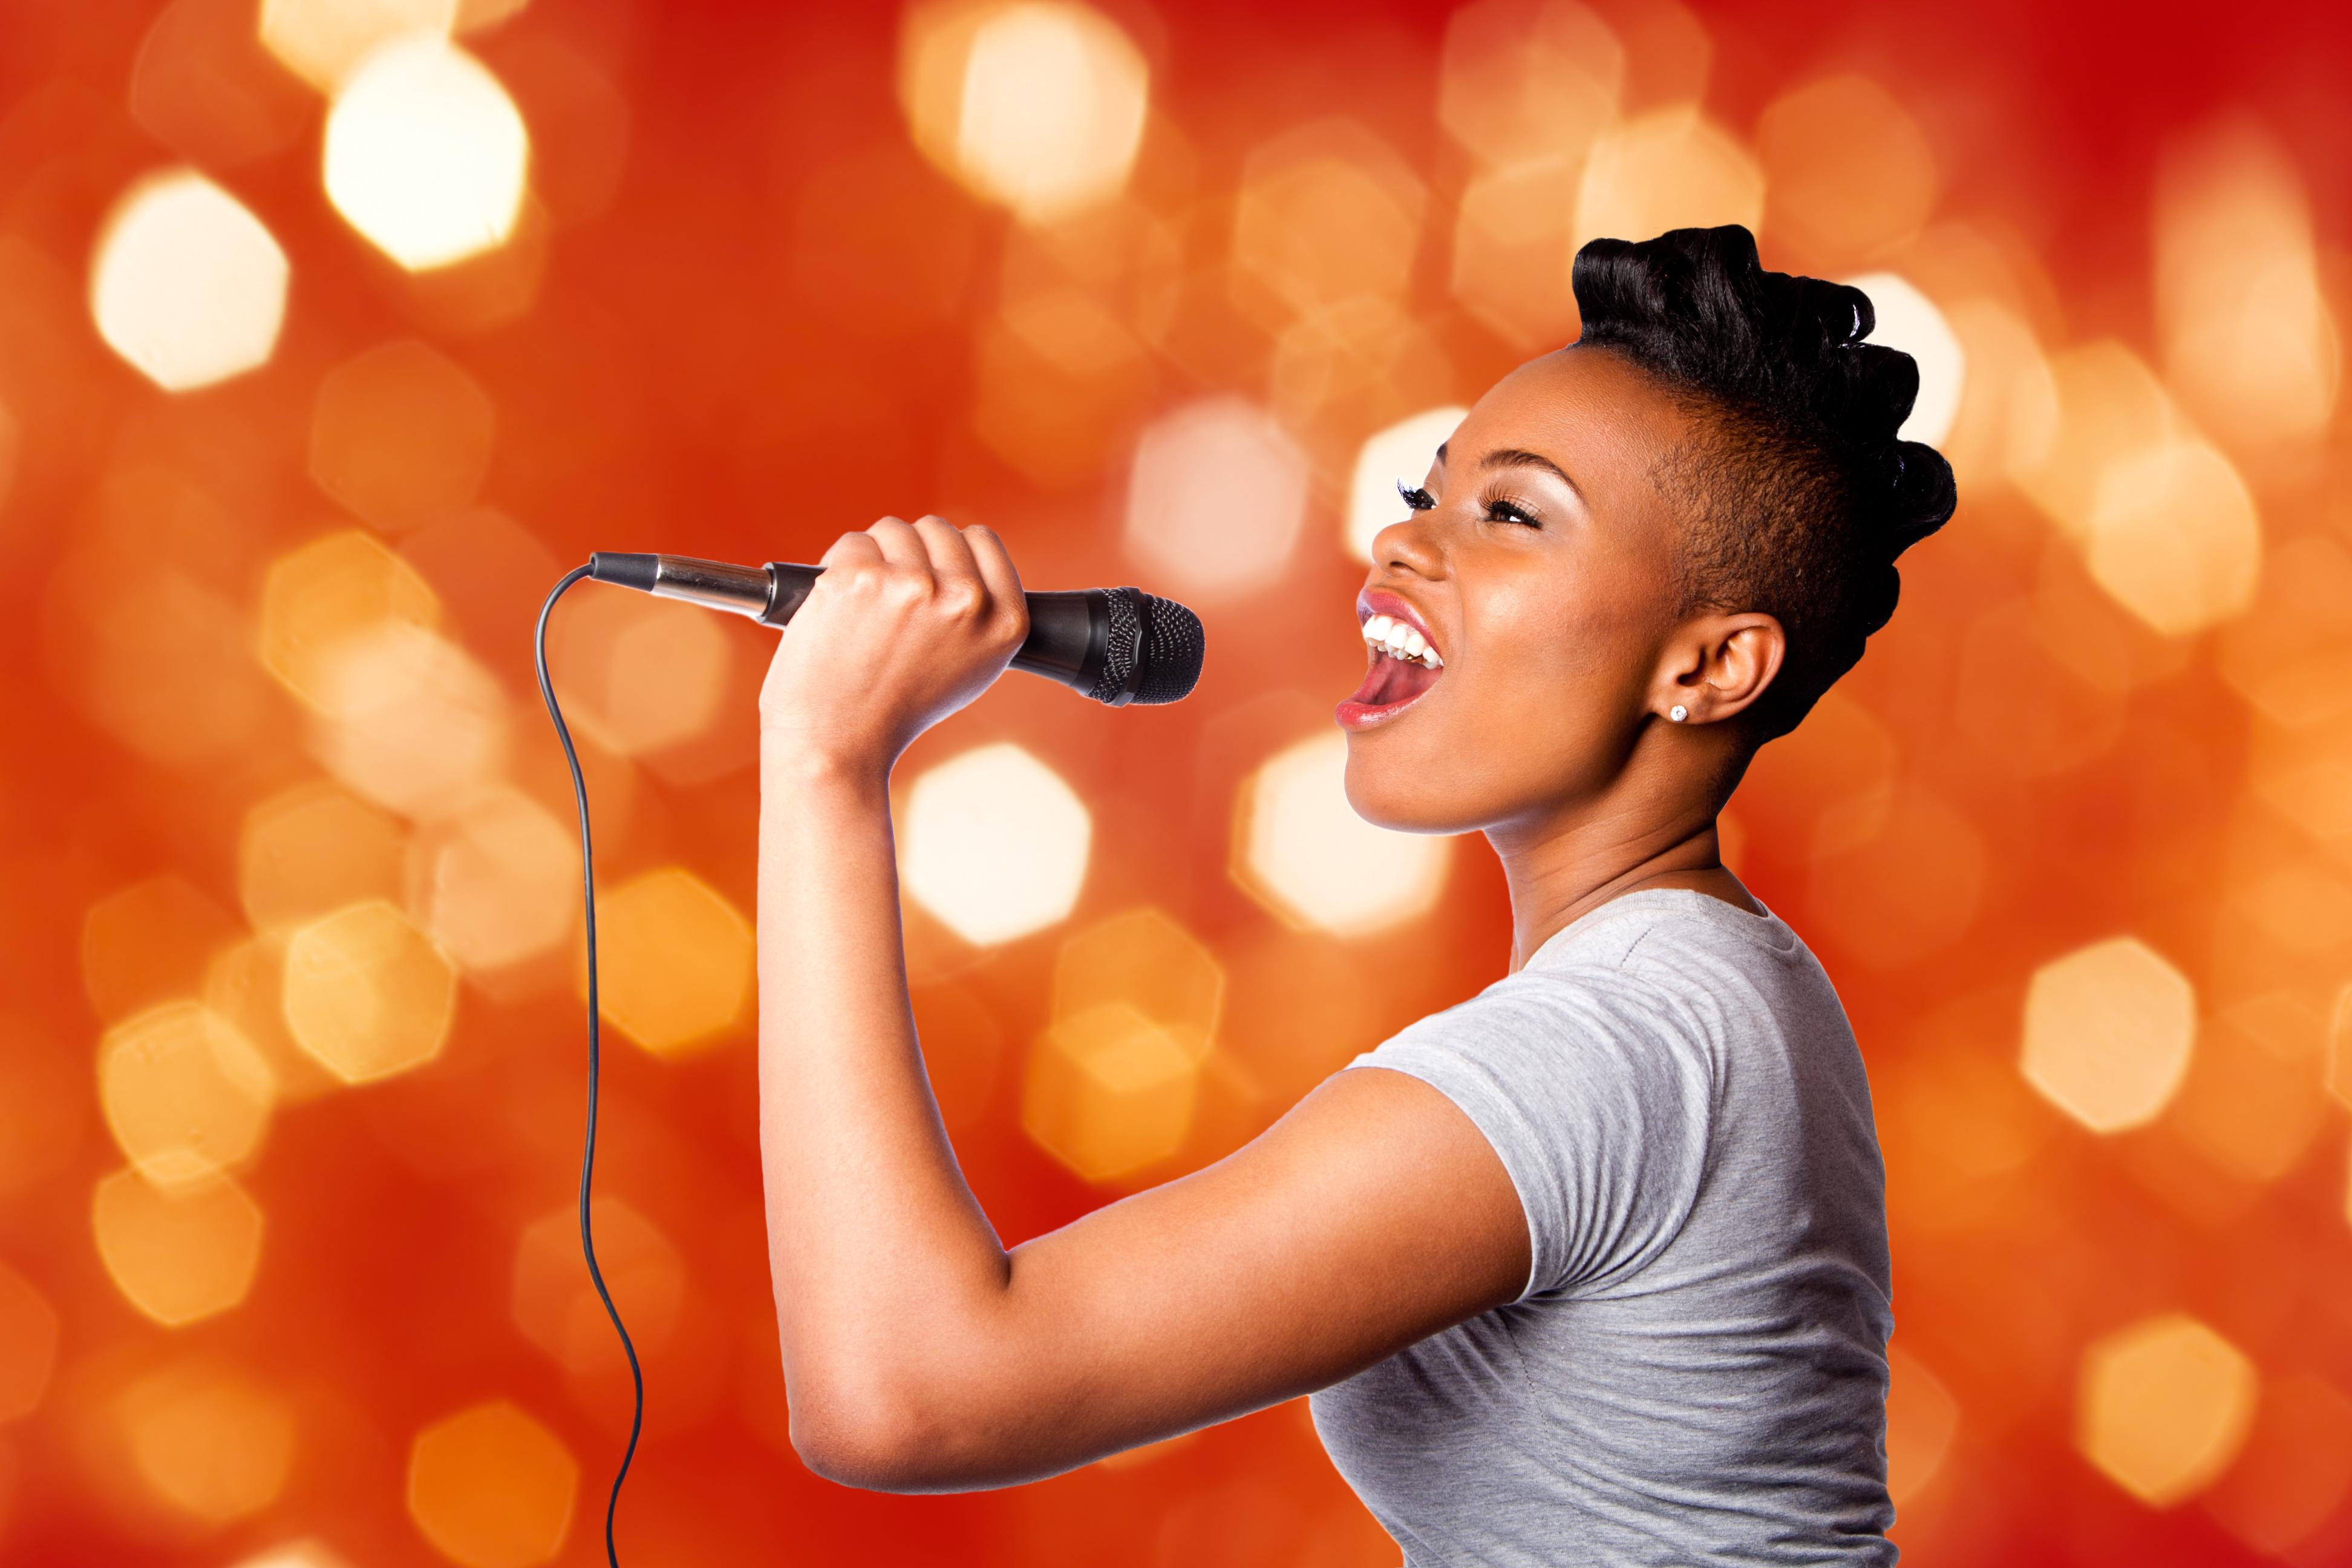 SING LIKE A PRO